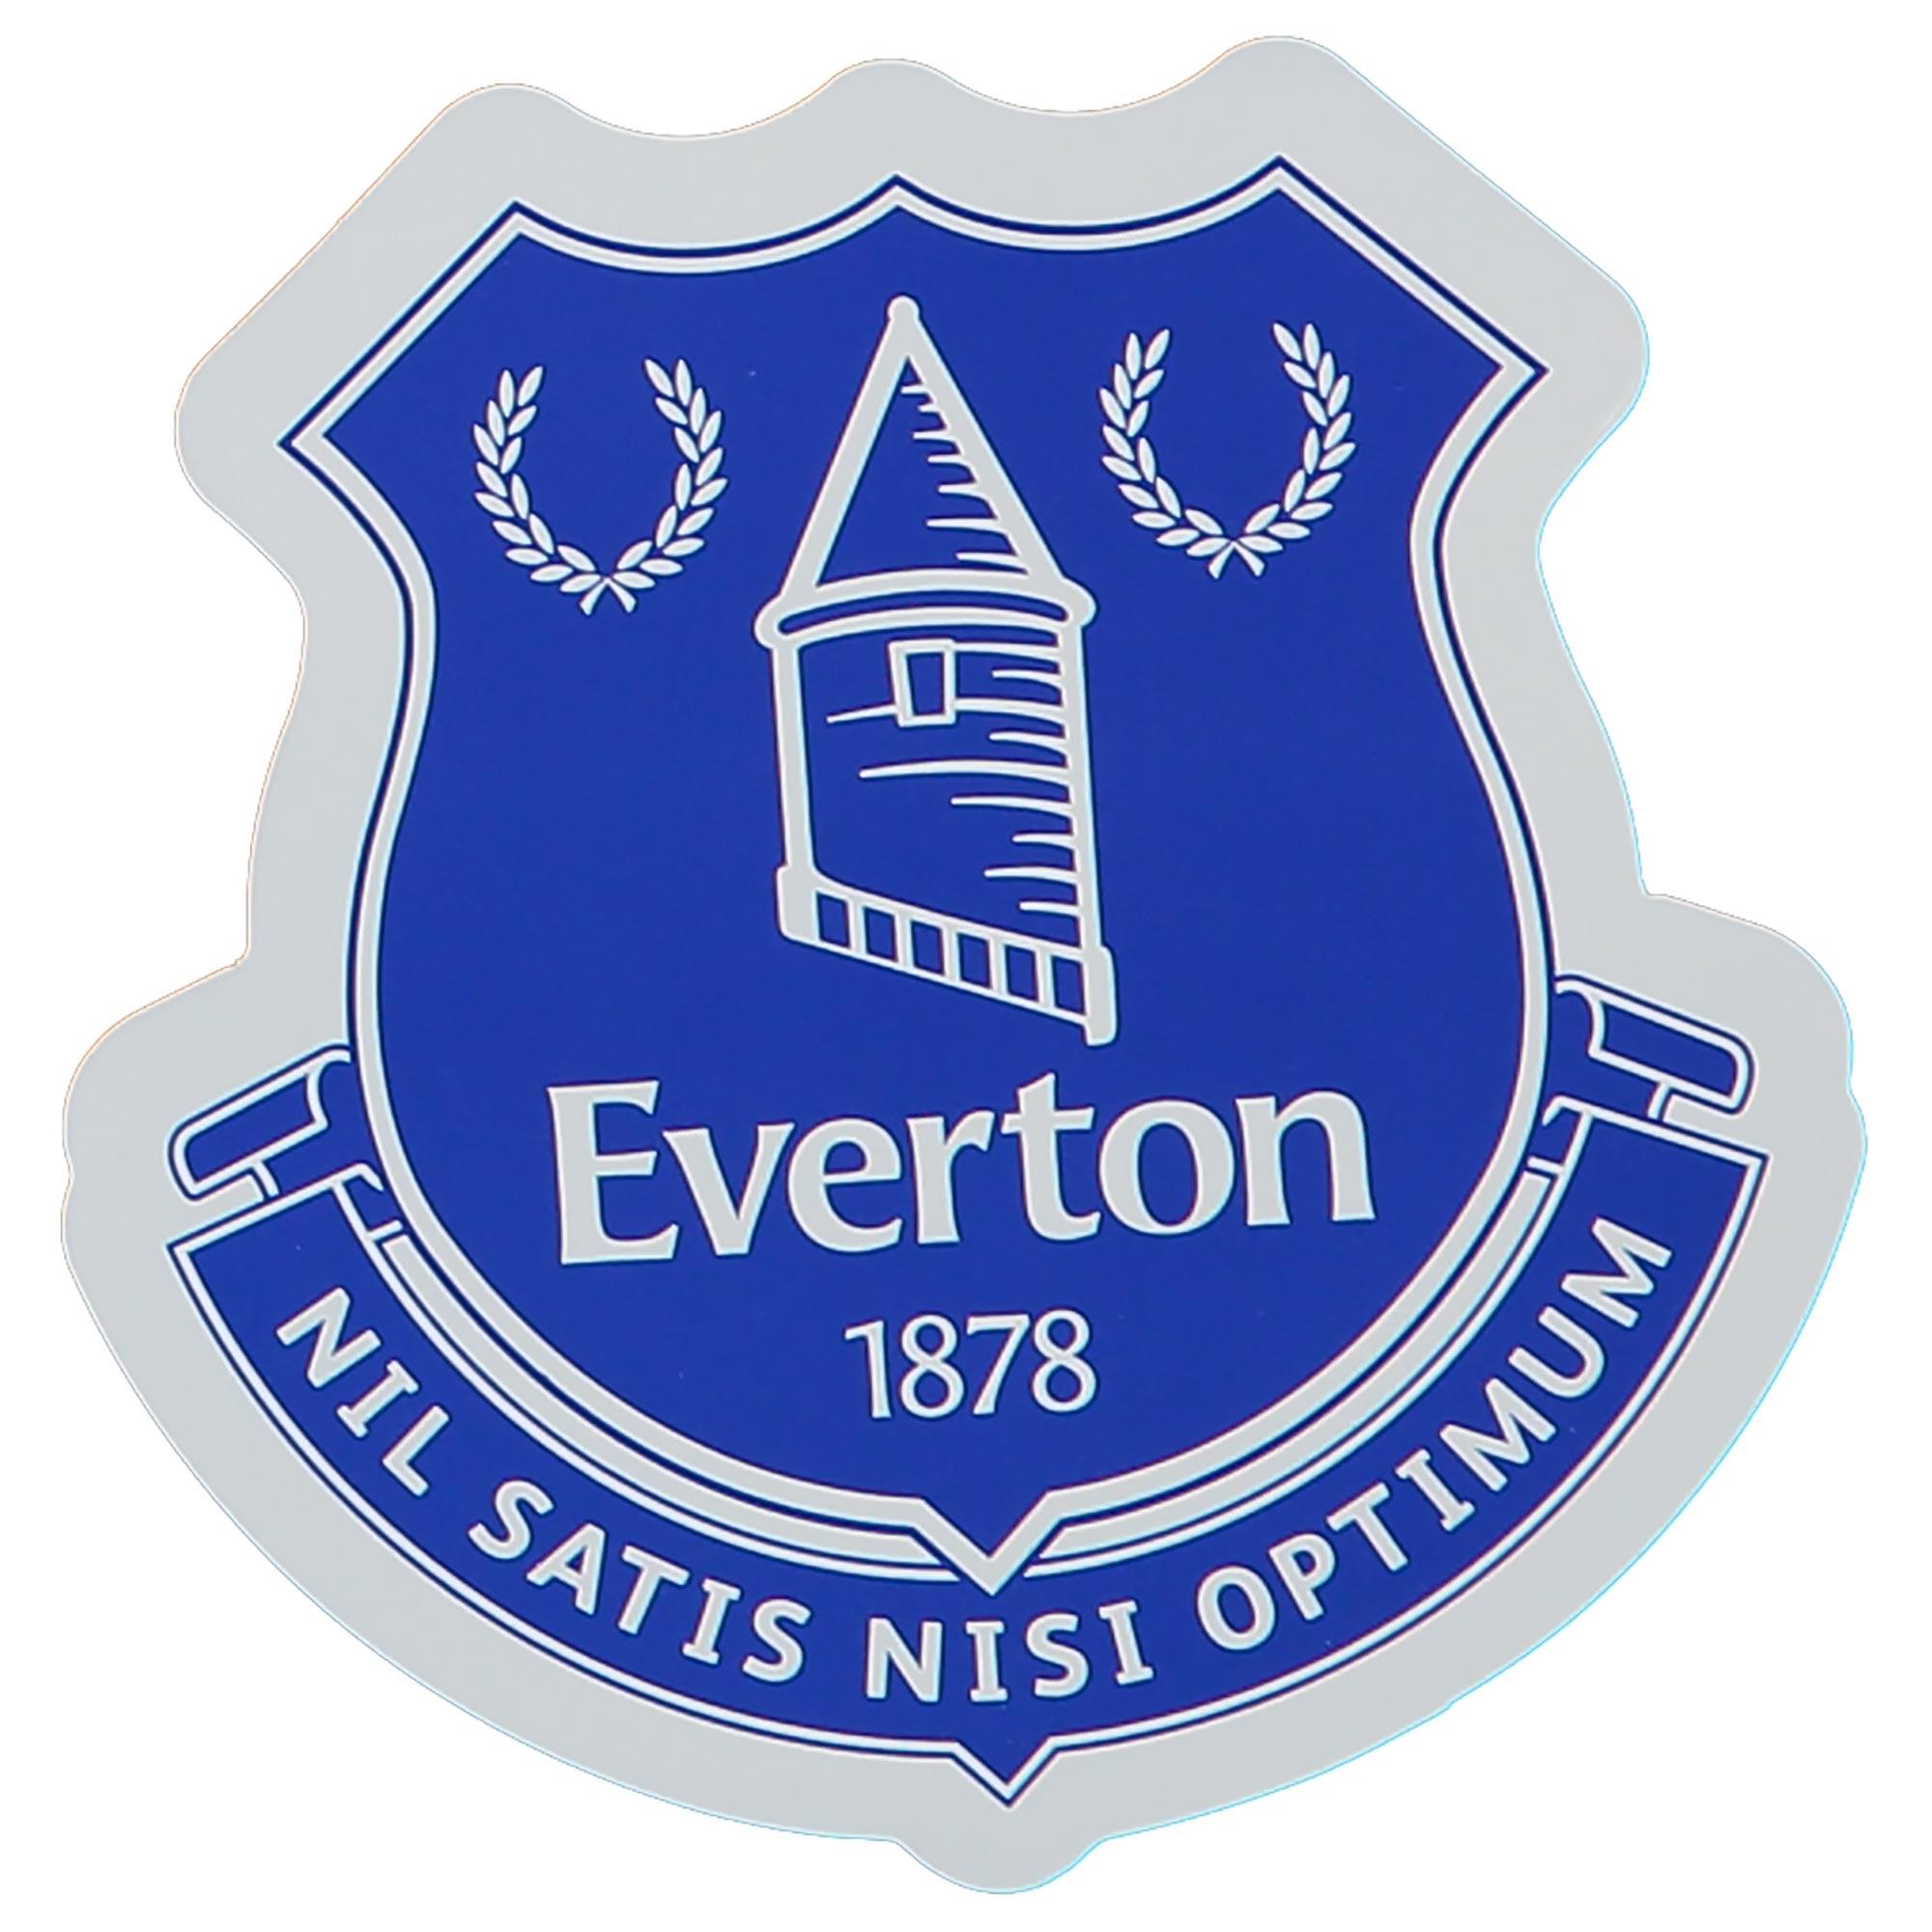 Everton Self Adhesive Car Sticker - 95 x 96mm